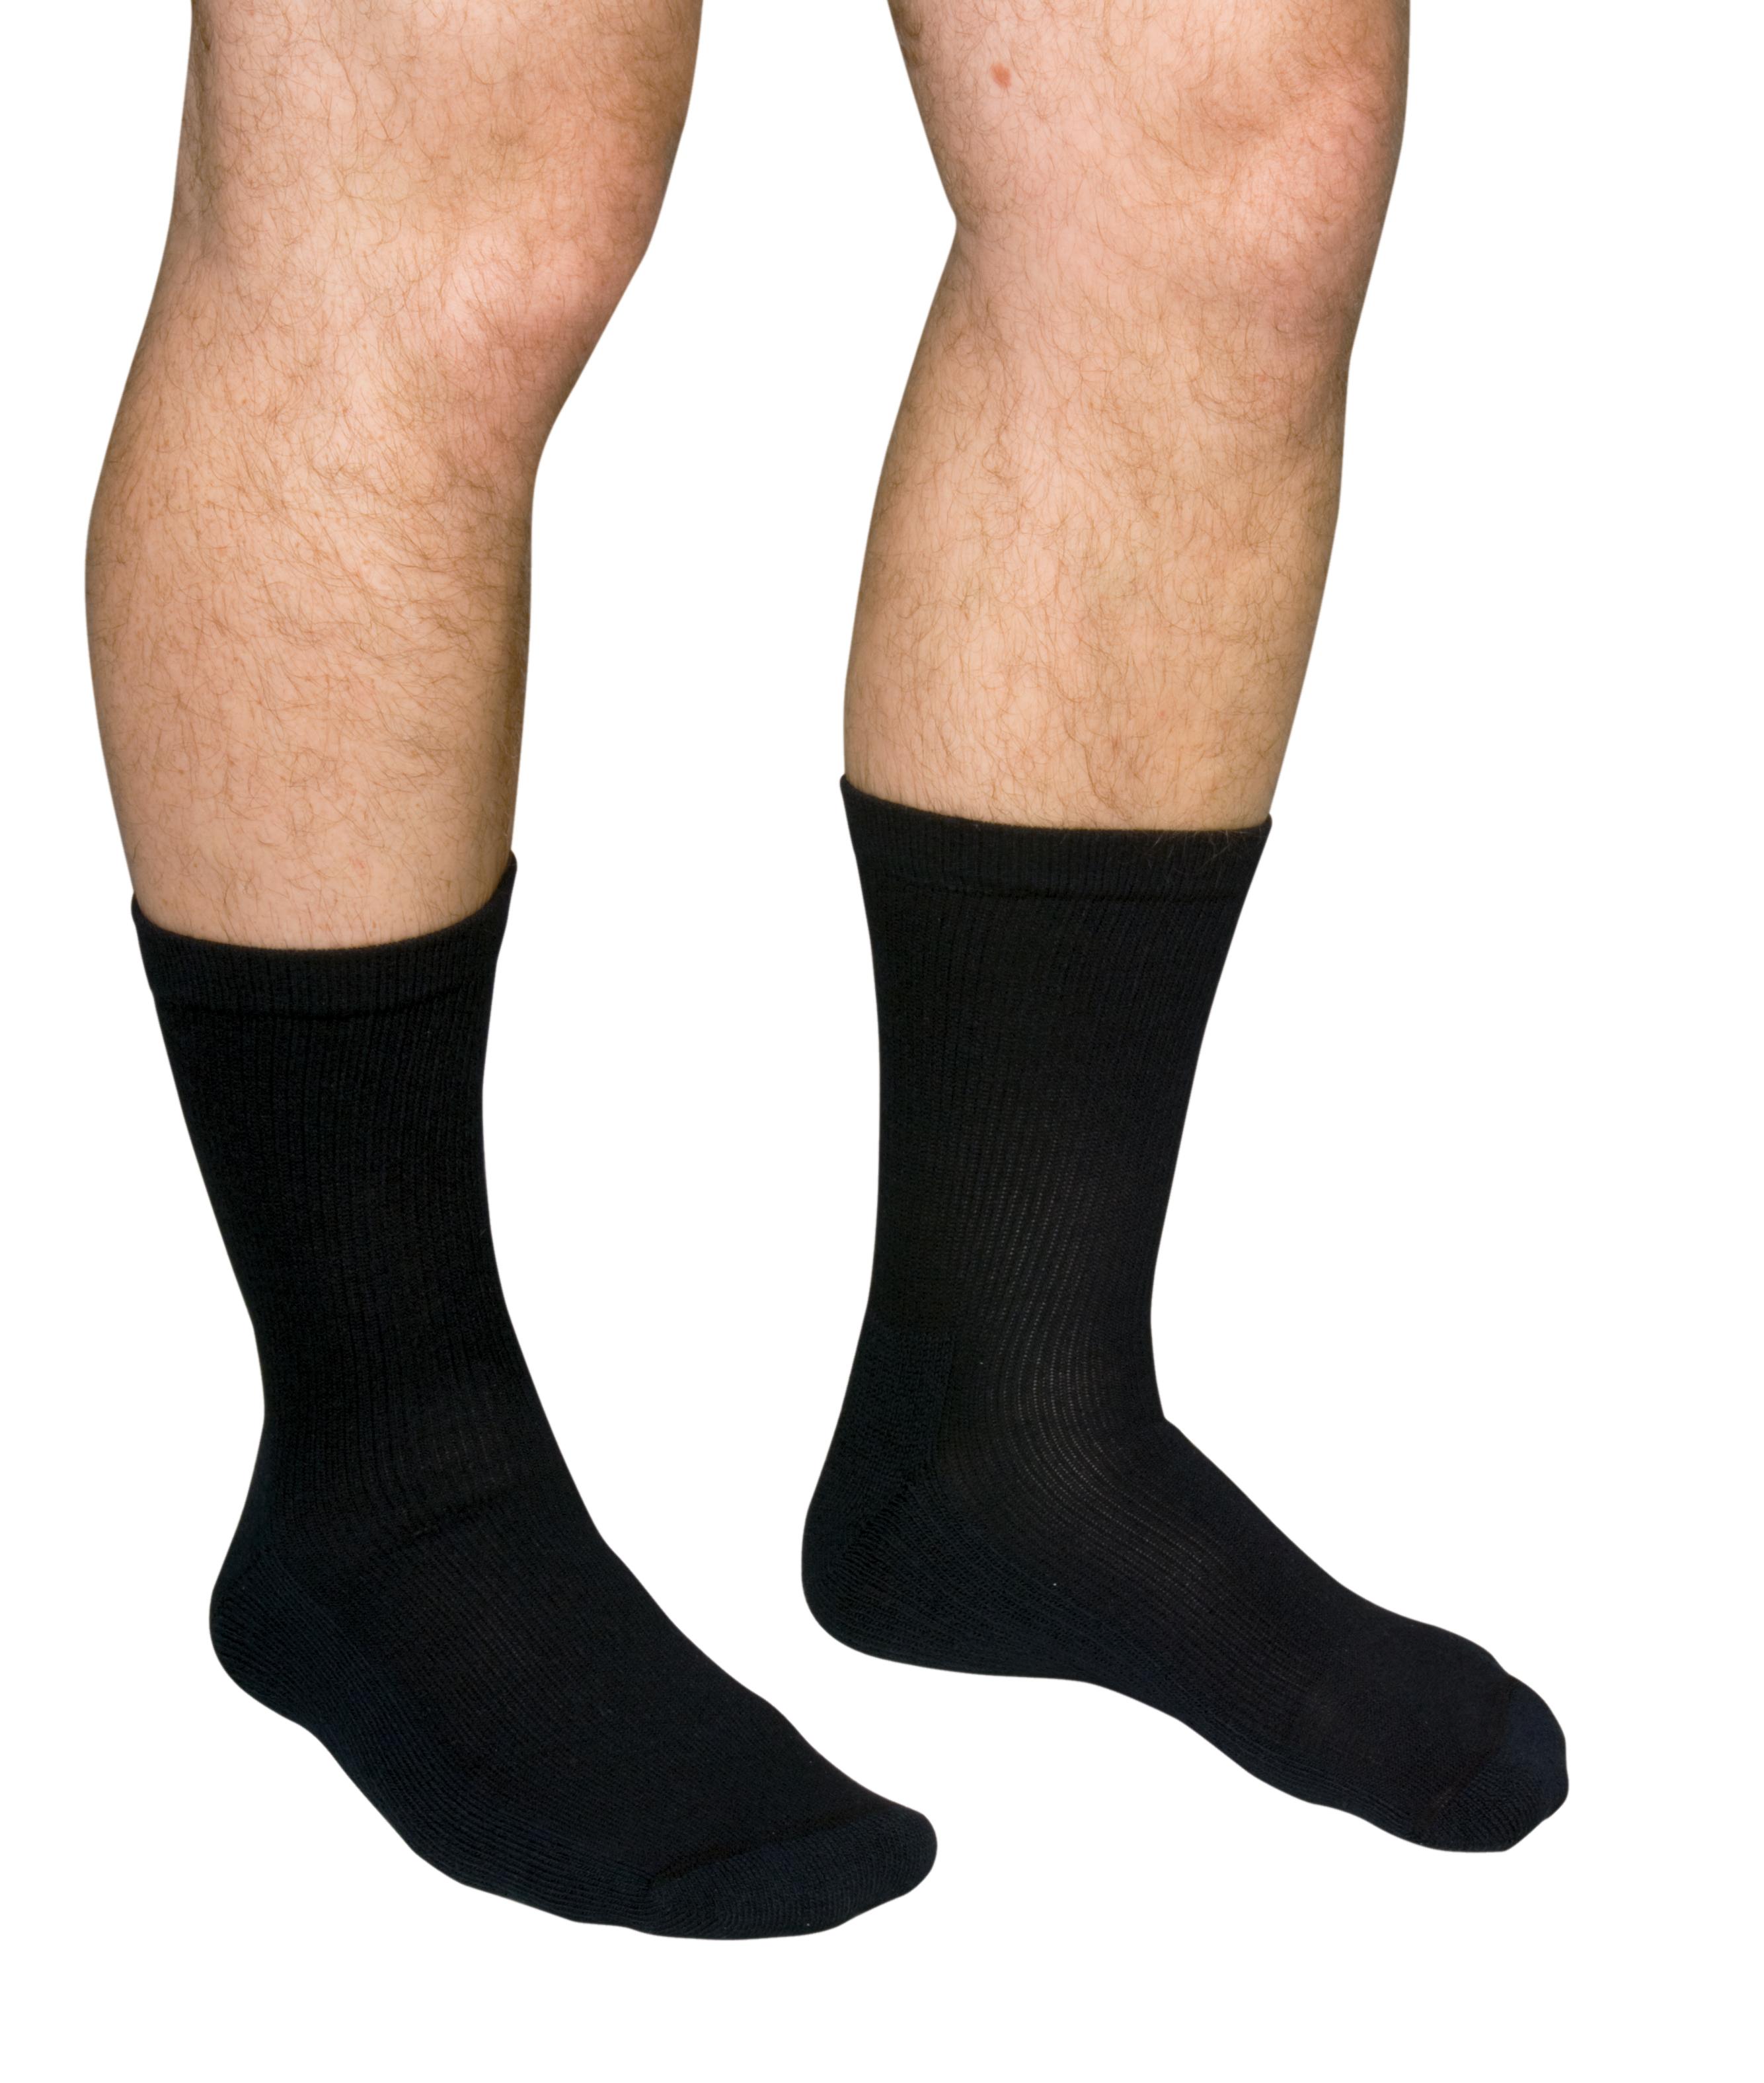 QCS Diabetic Care Crew Sock for Men and Women, White, MCO1680WHIMD, Medium